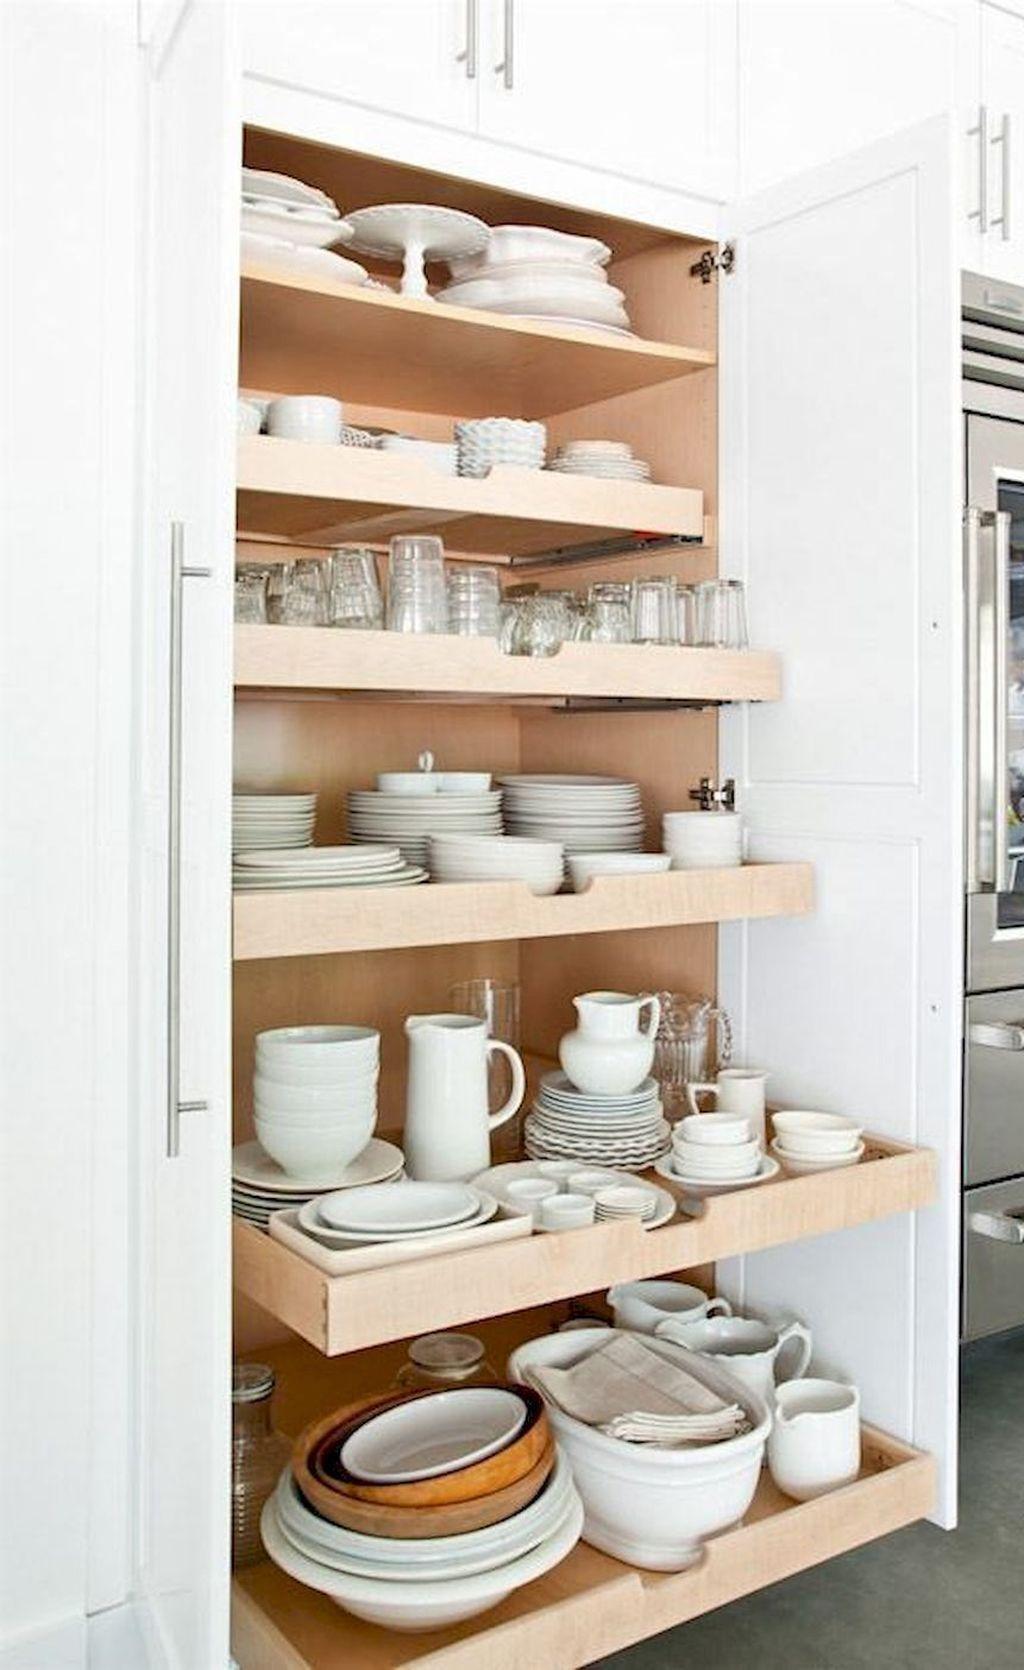 49 Elegant Small Kitchen Ideas Remodel #kitchenremodelsmall